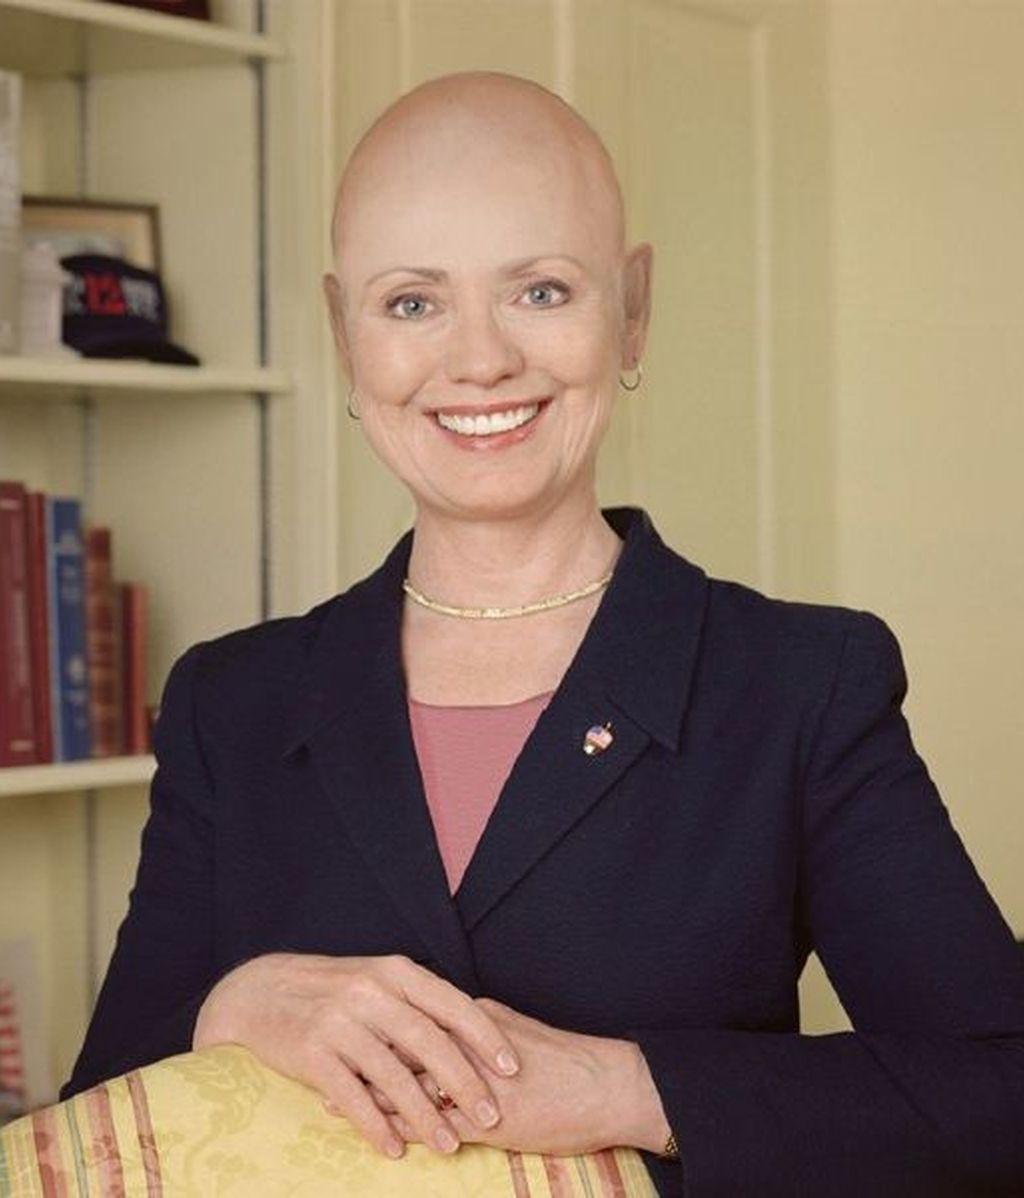 Imagina a Hillary Clinton